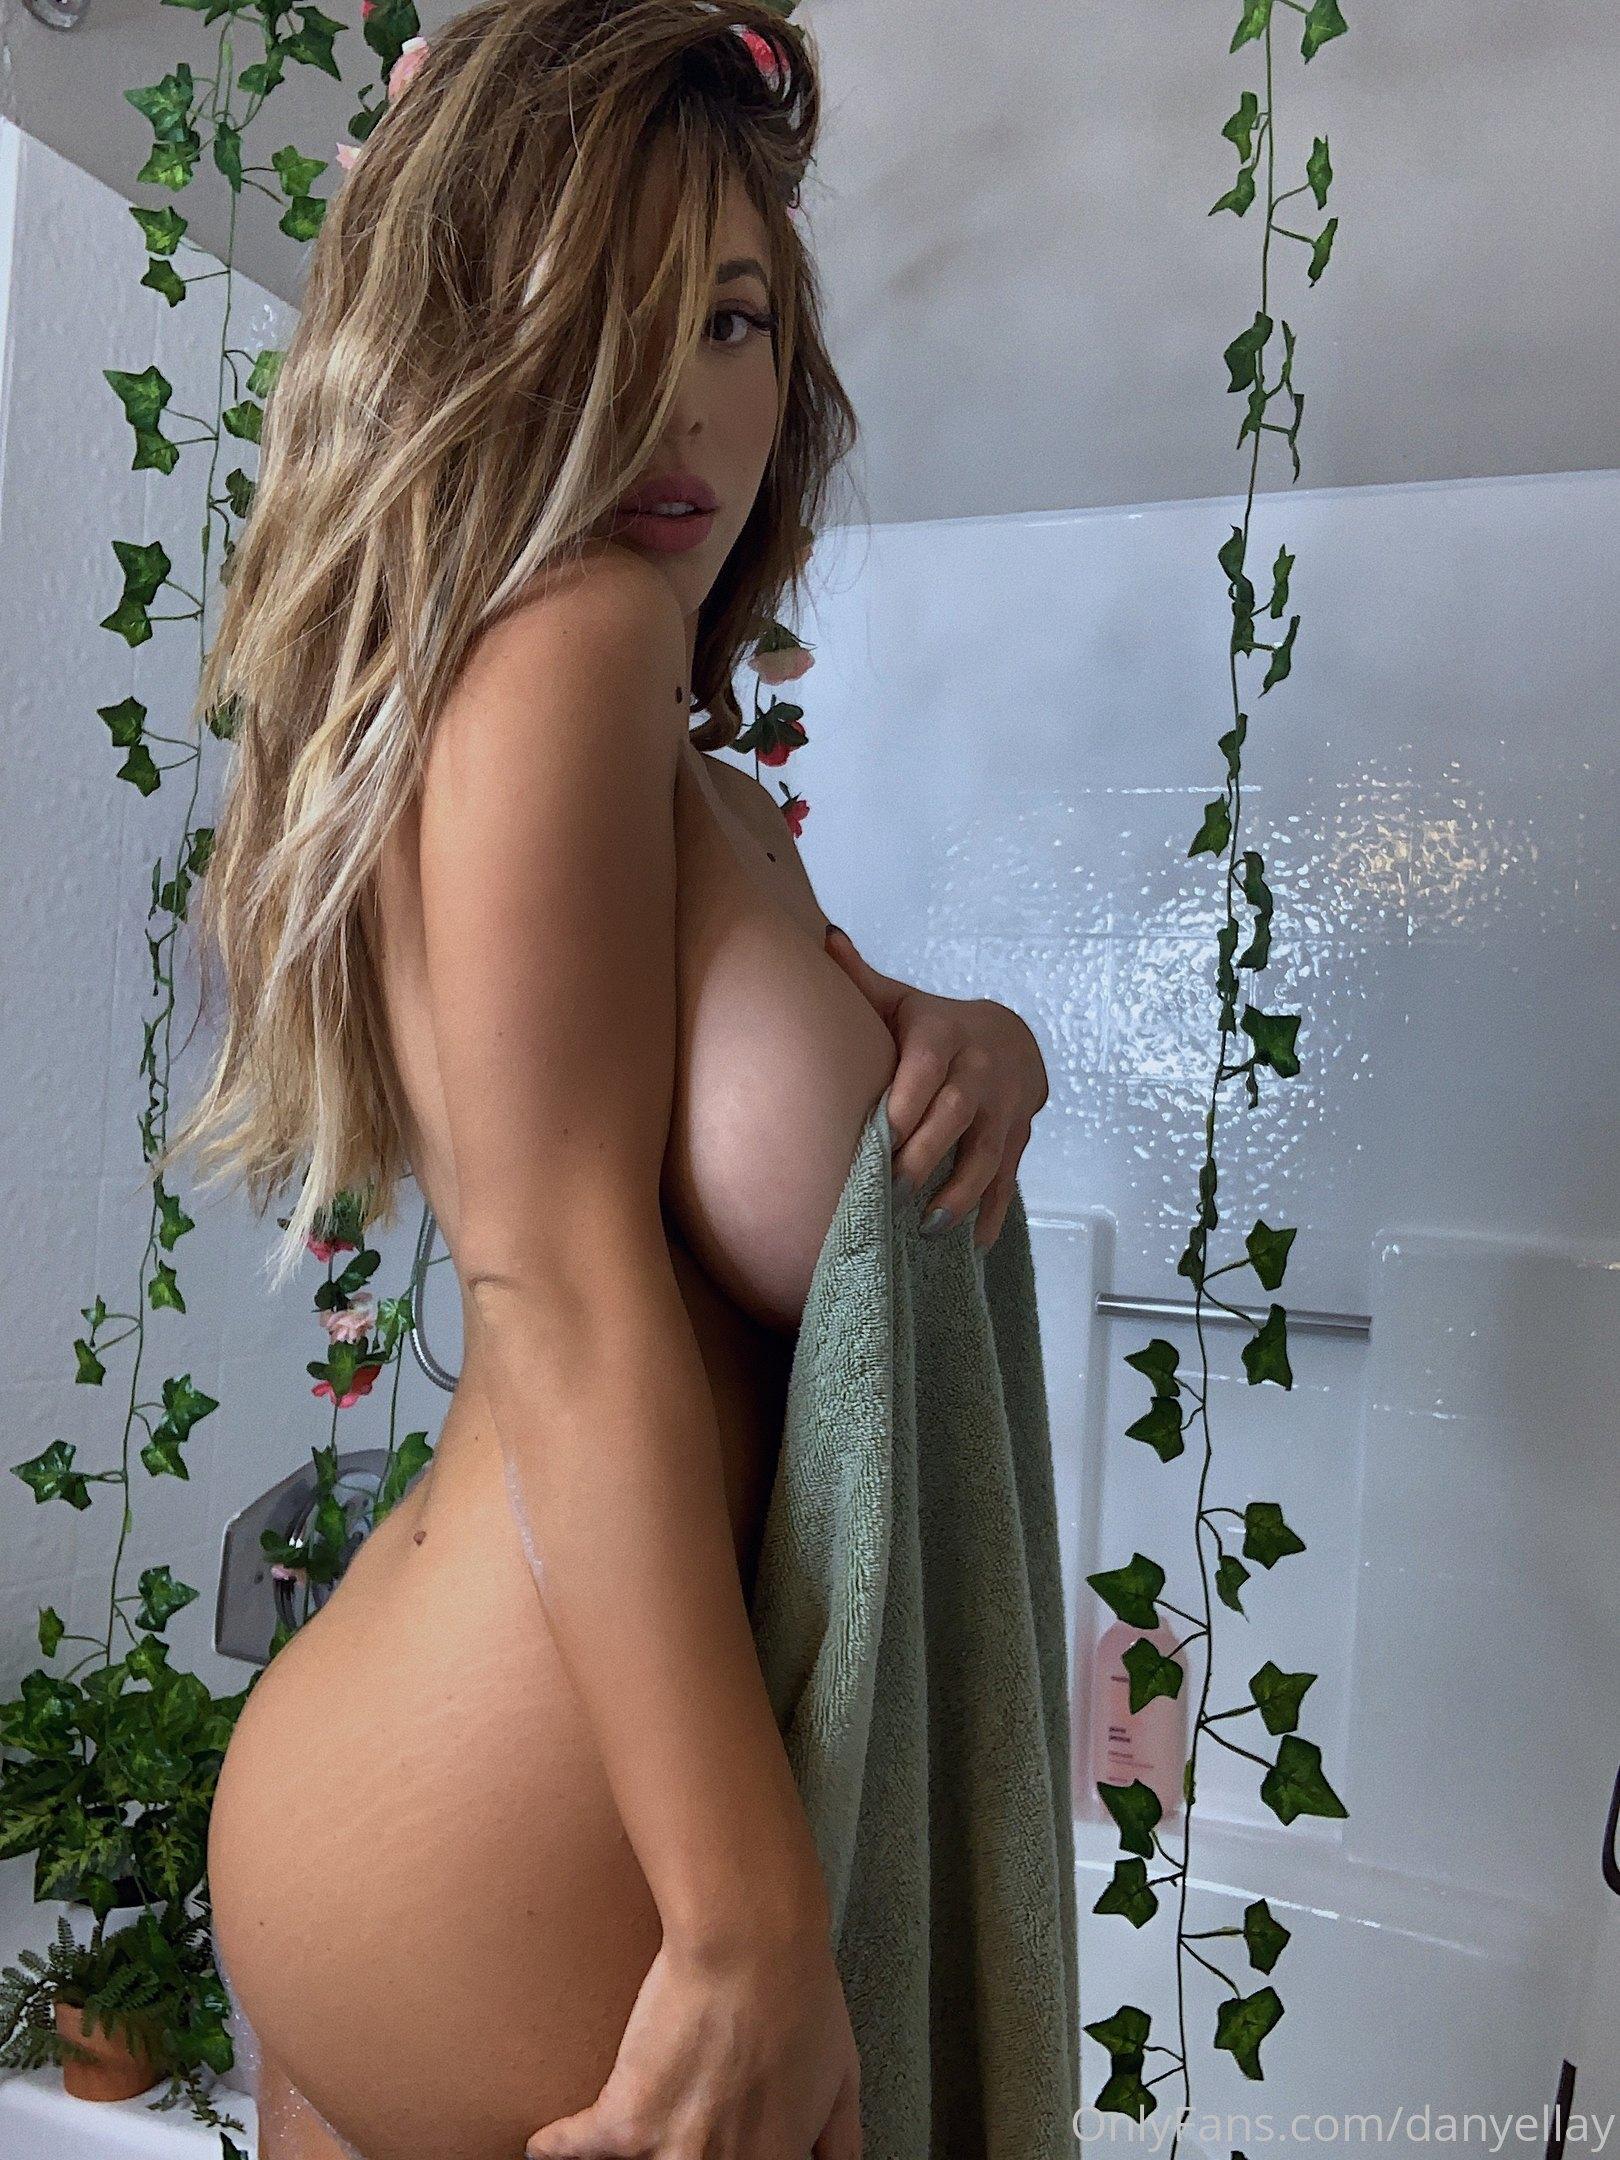 Danielley Ayala 0032